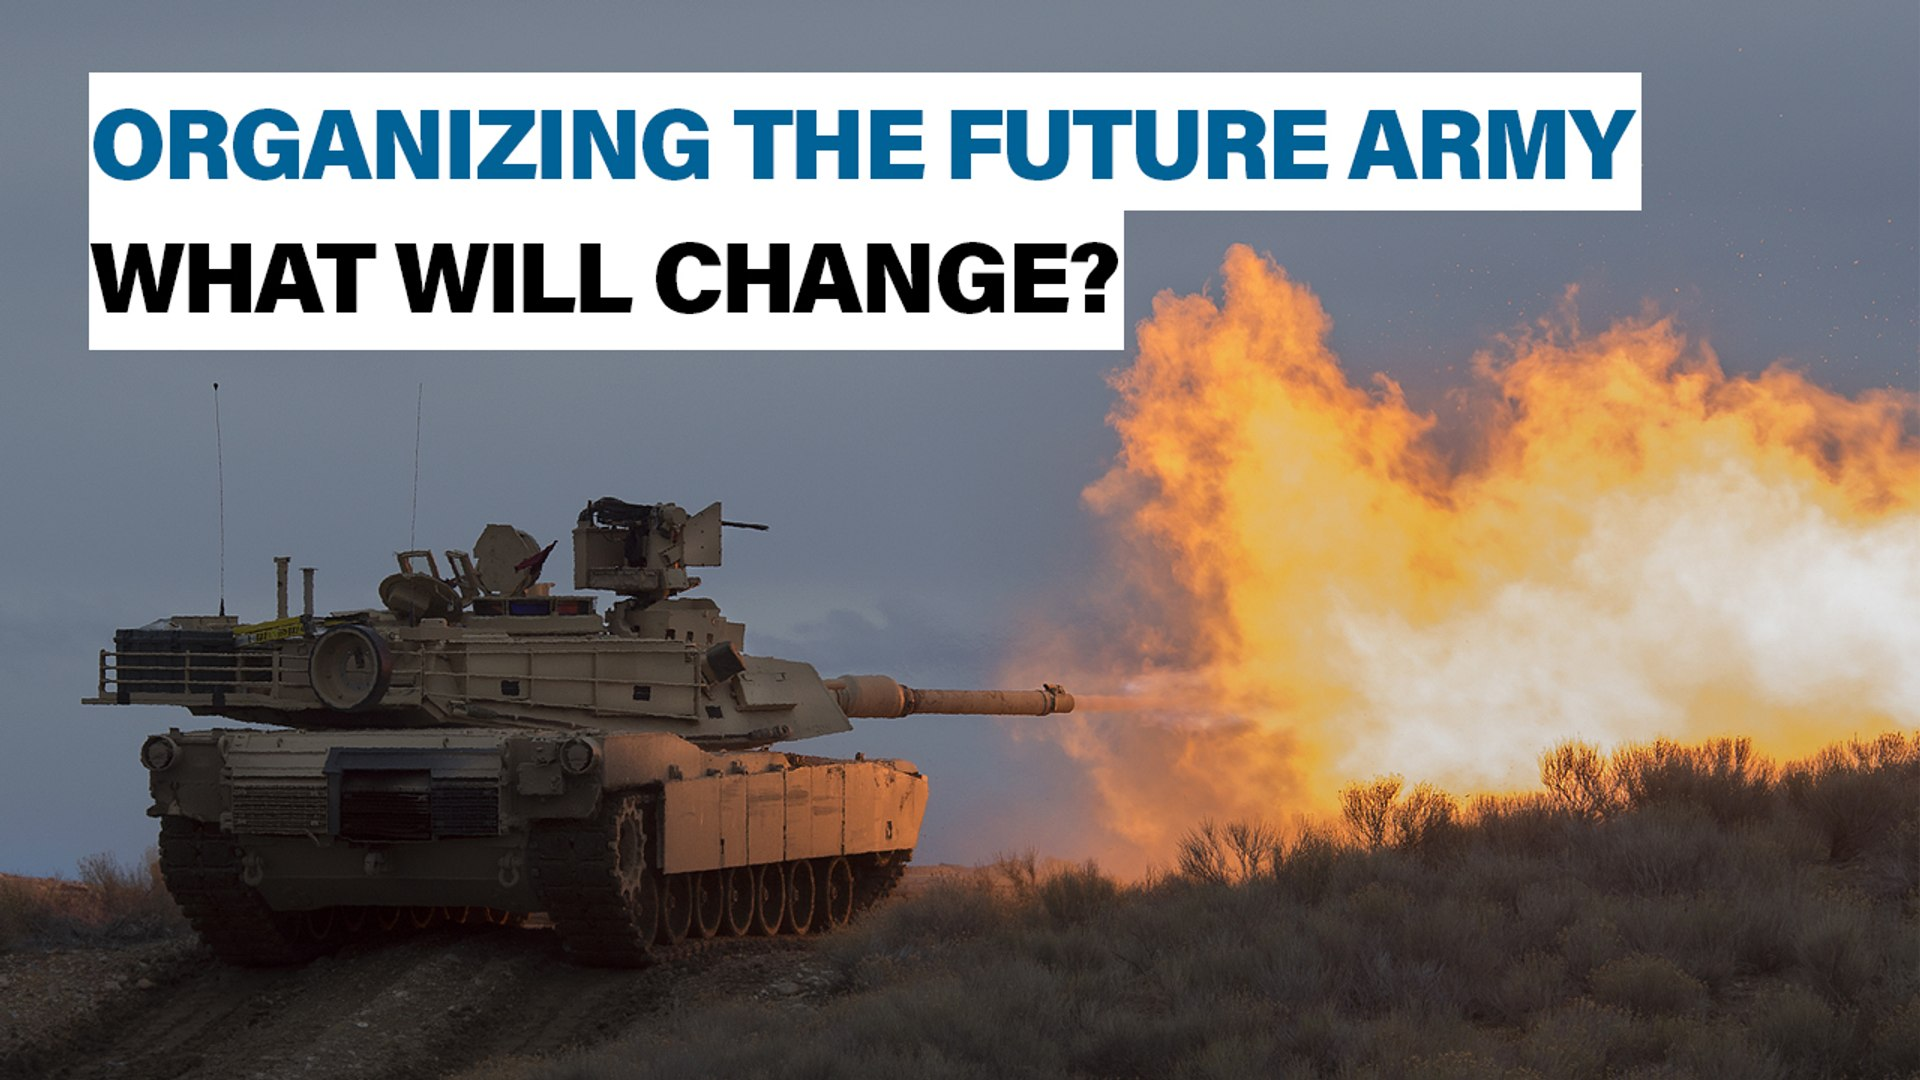 Organizing the Future U.S. Army | Defense News Weekly, Aug. 23, 2019